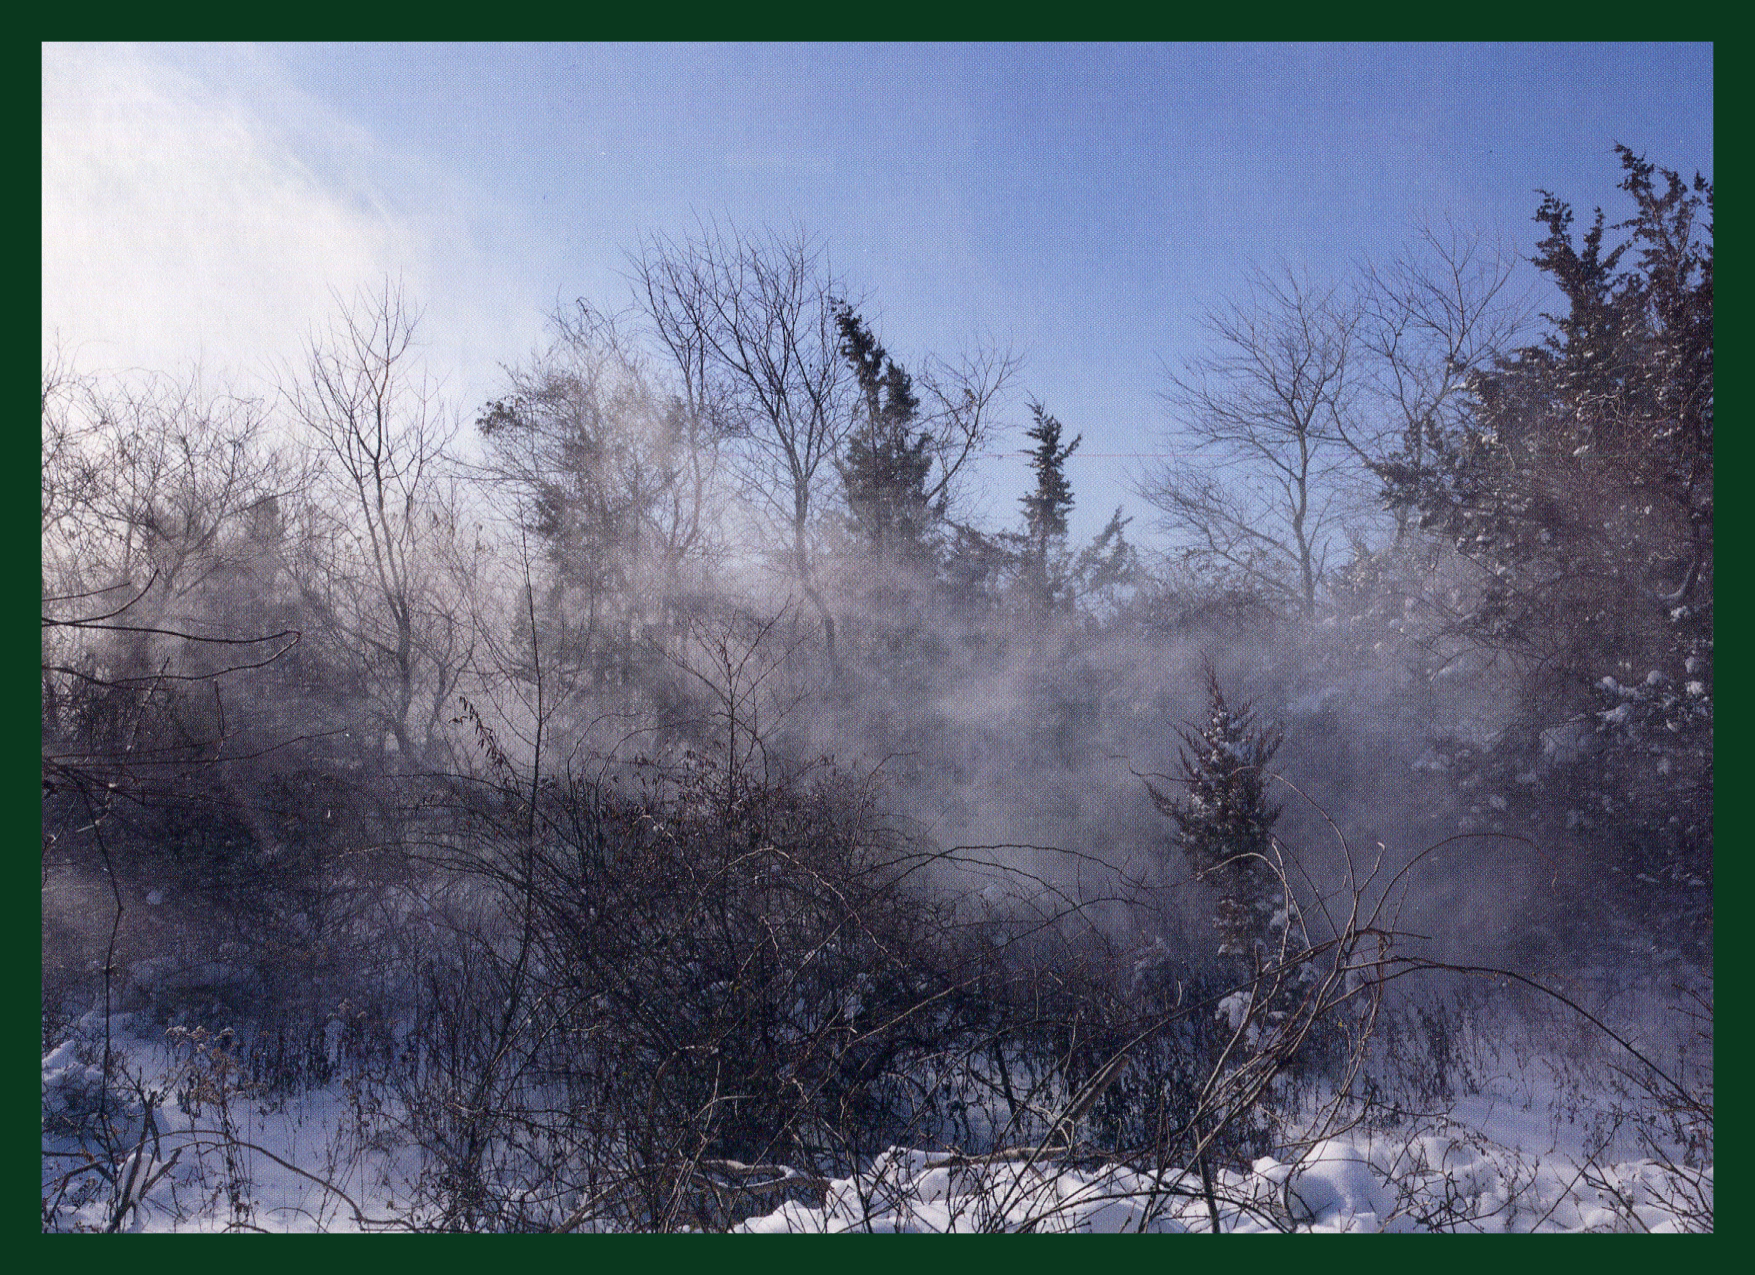 Brambles And Mist